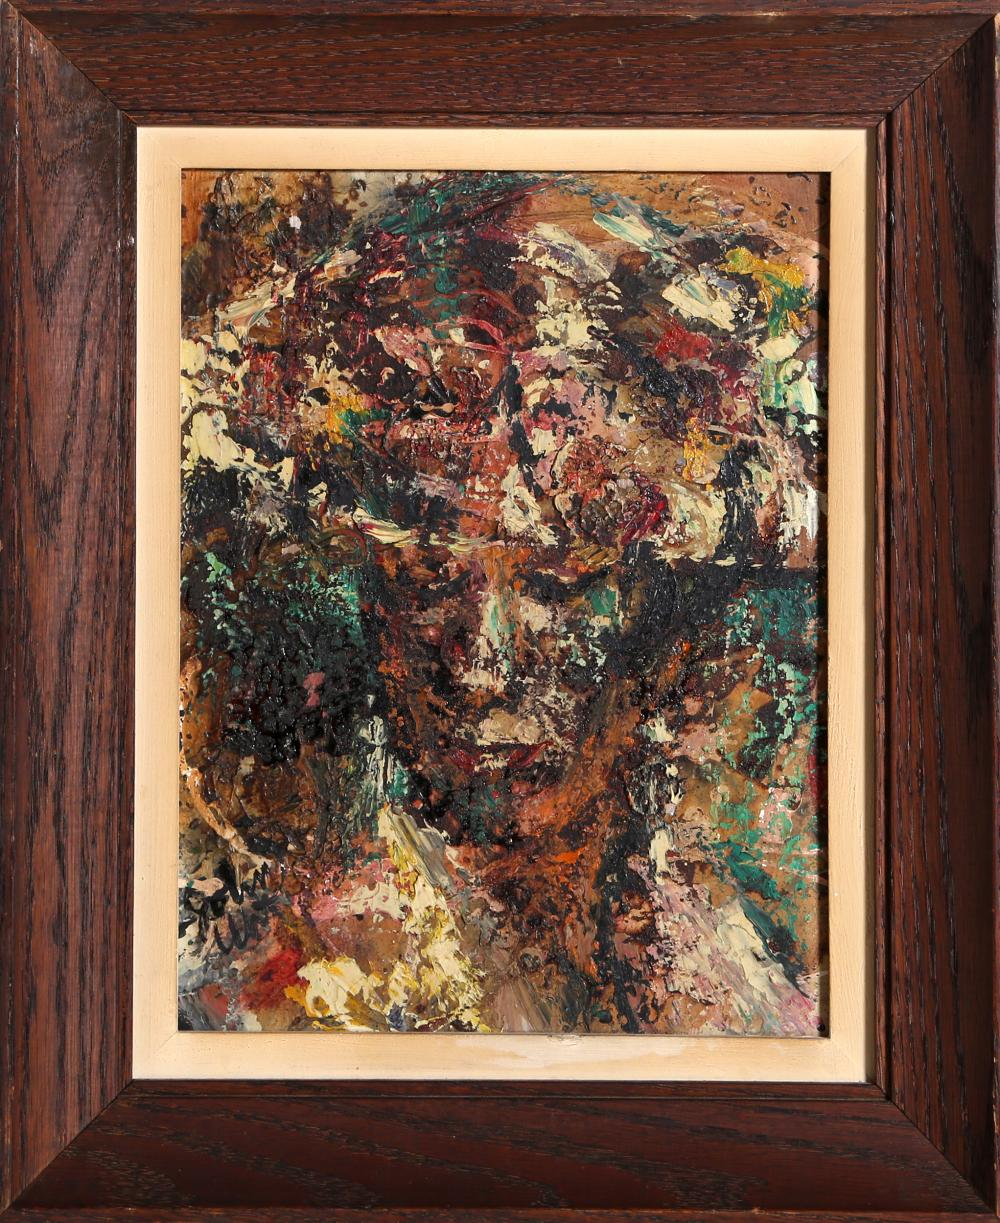 John Uht, Portrait of a Woman, Oil Painting